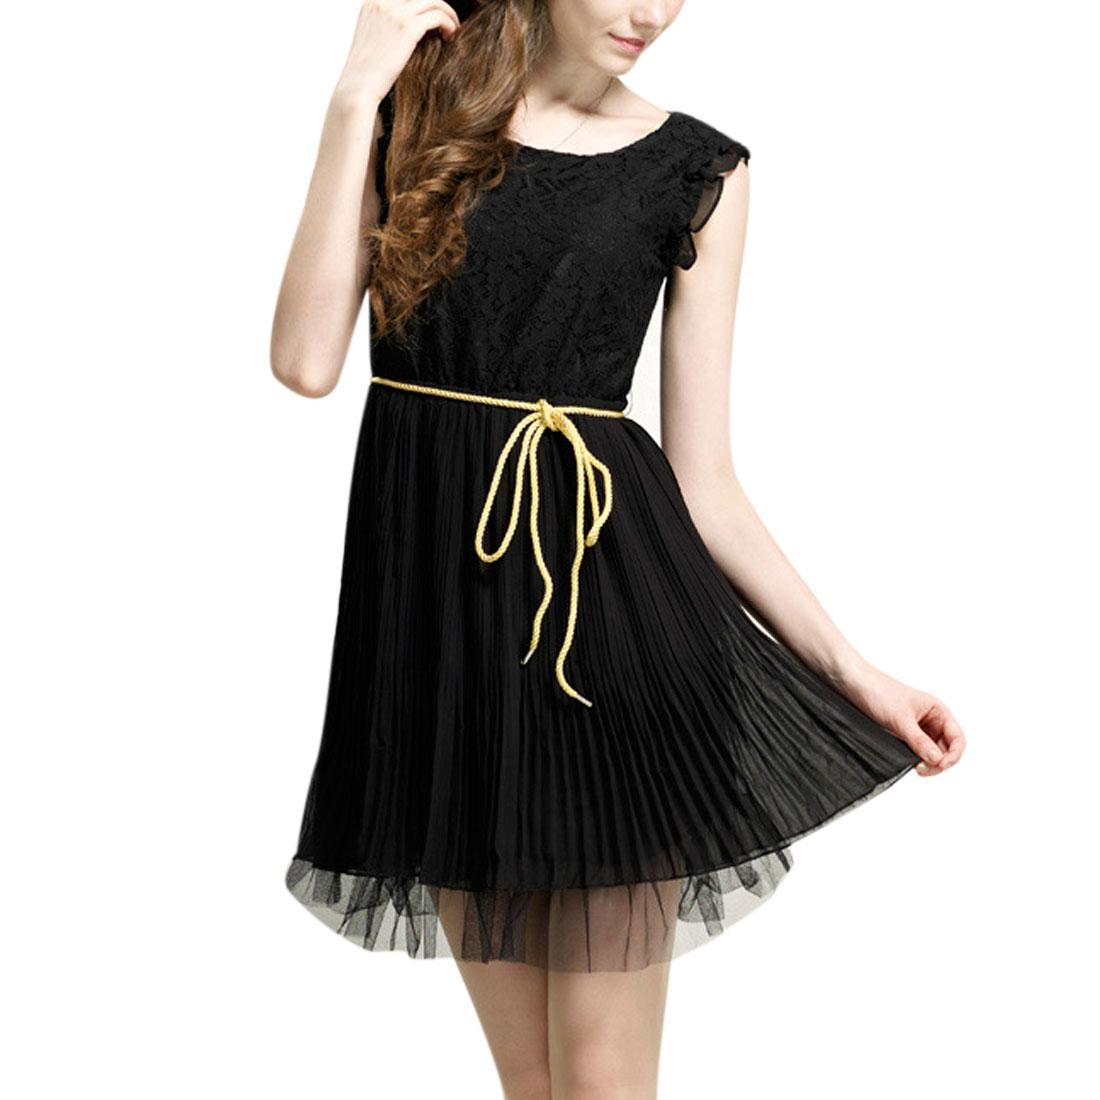 Women Zipper Up Round Neck Lace Pleated A Line Dress Black XS